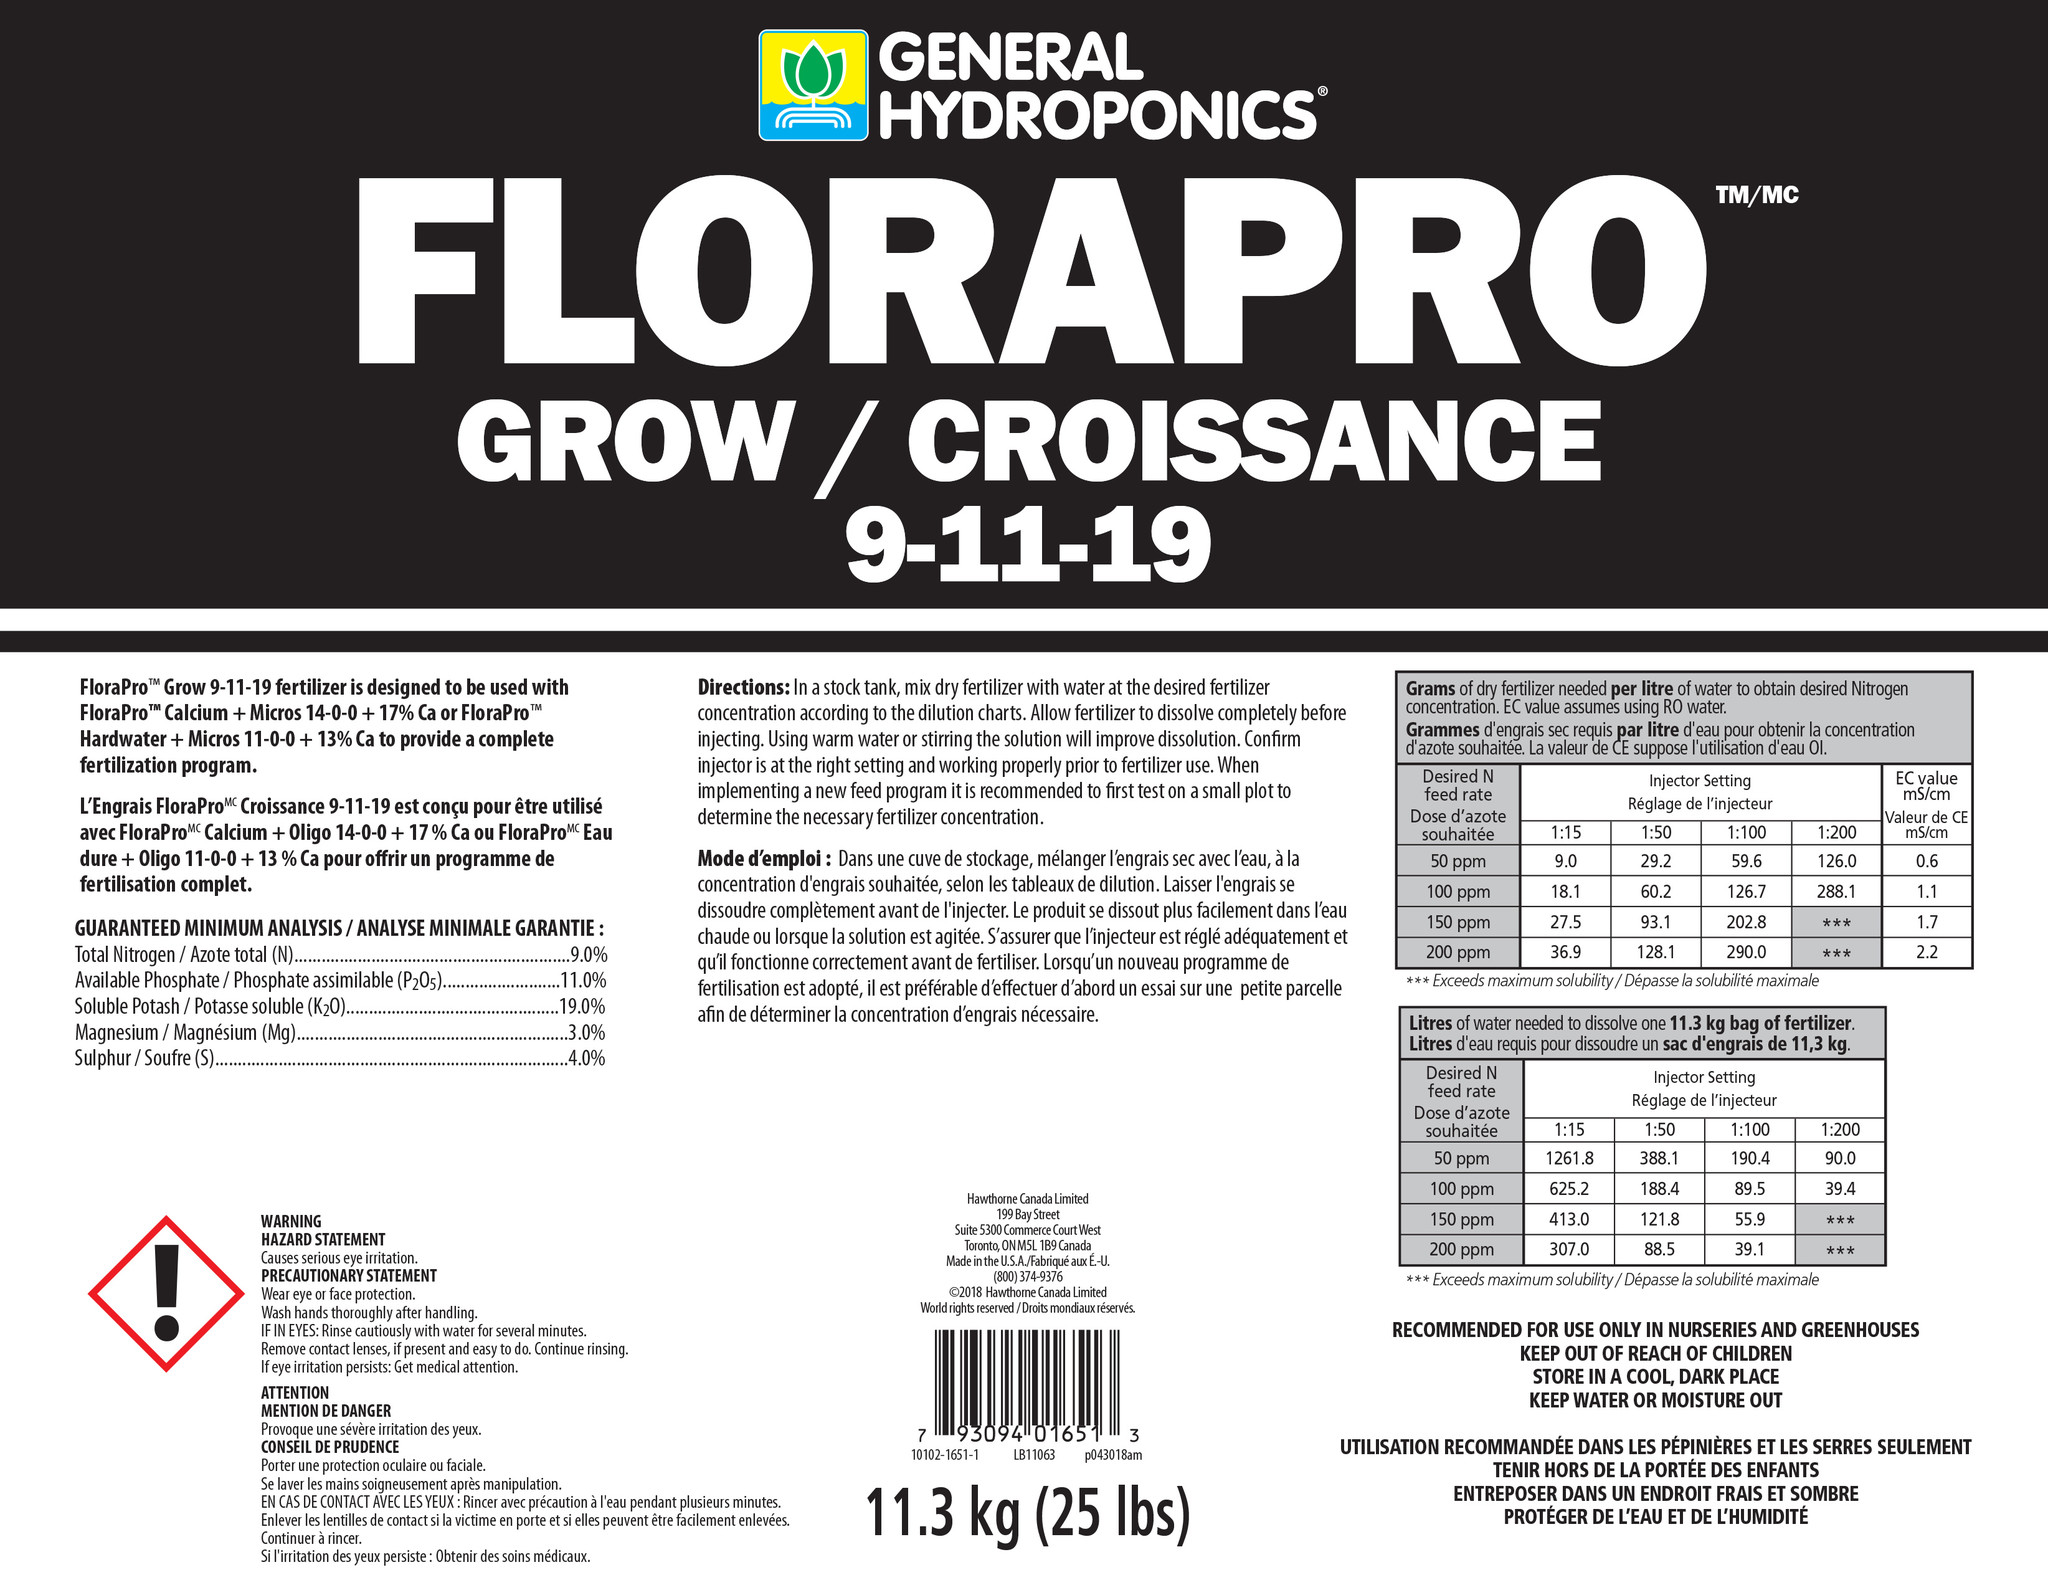 General Hydroponics General Hydroponics - FloraPro Grow 25lb